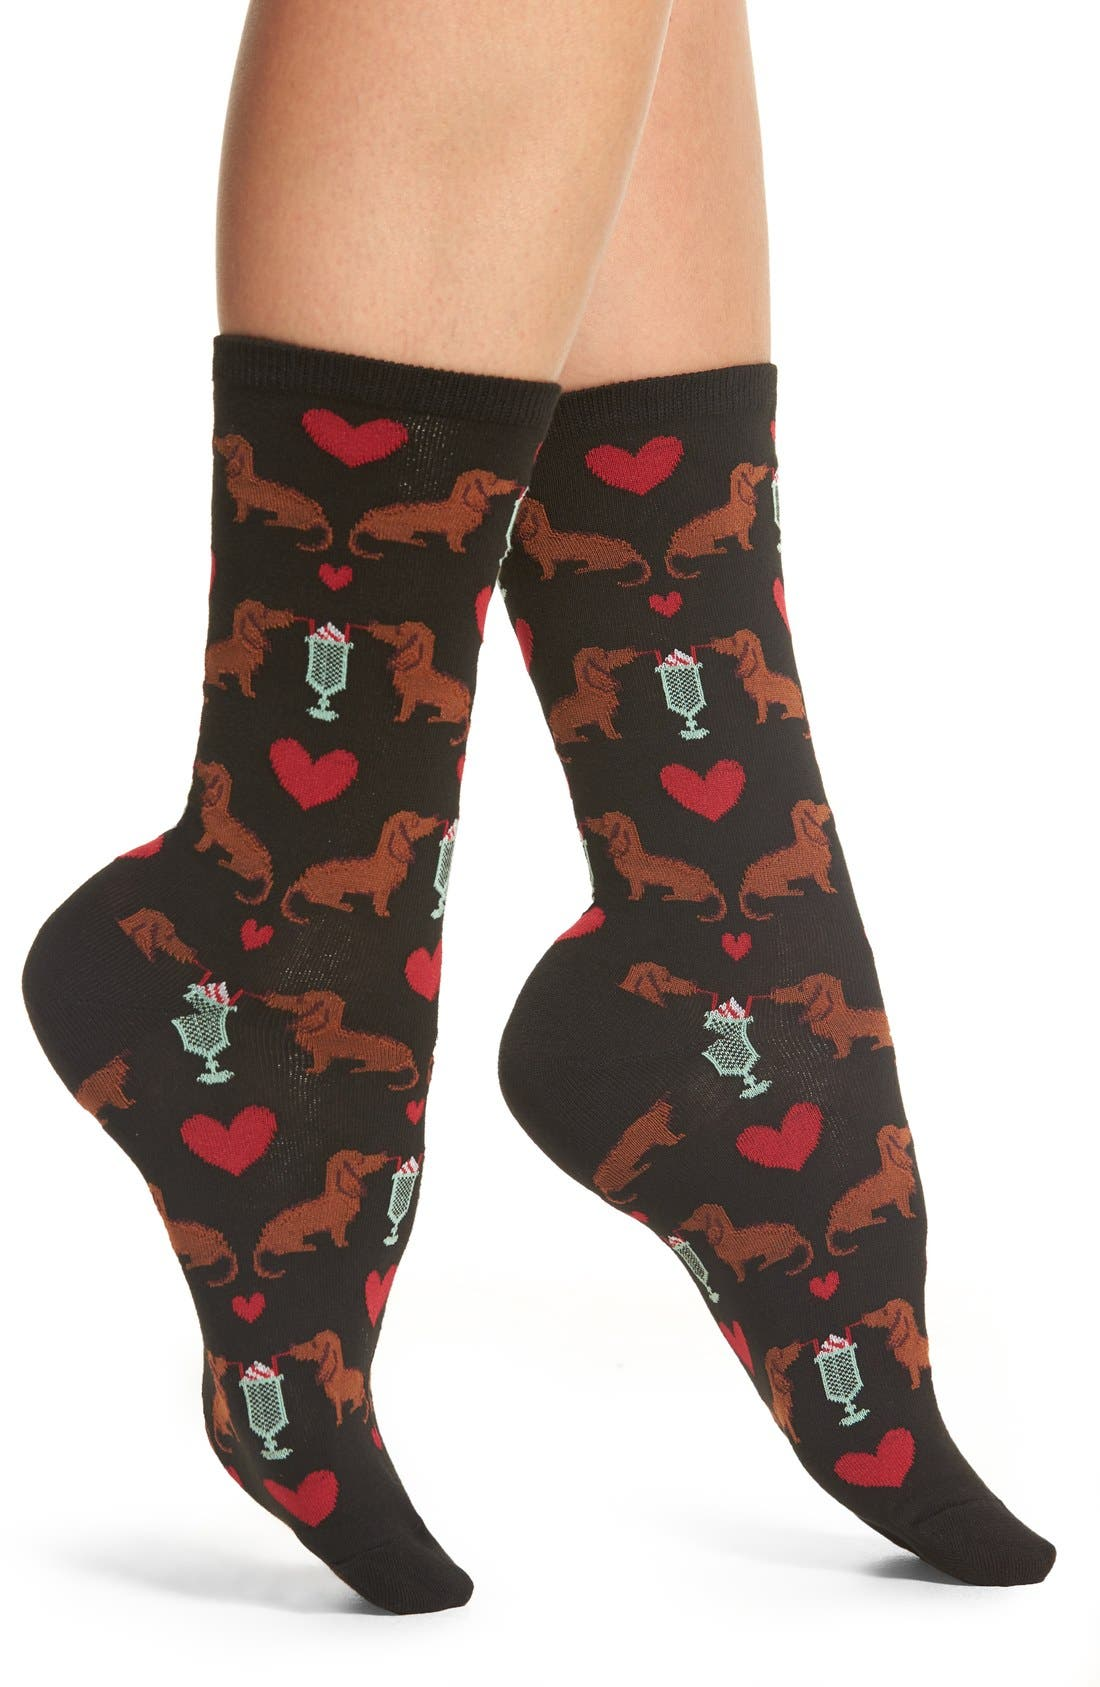 Main Image - Hot Sox 'Dogs & Milkshake' Crew Socks